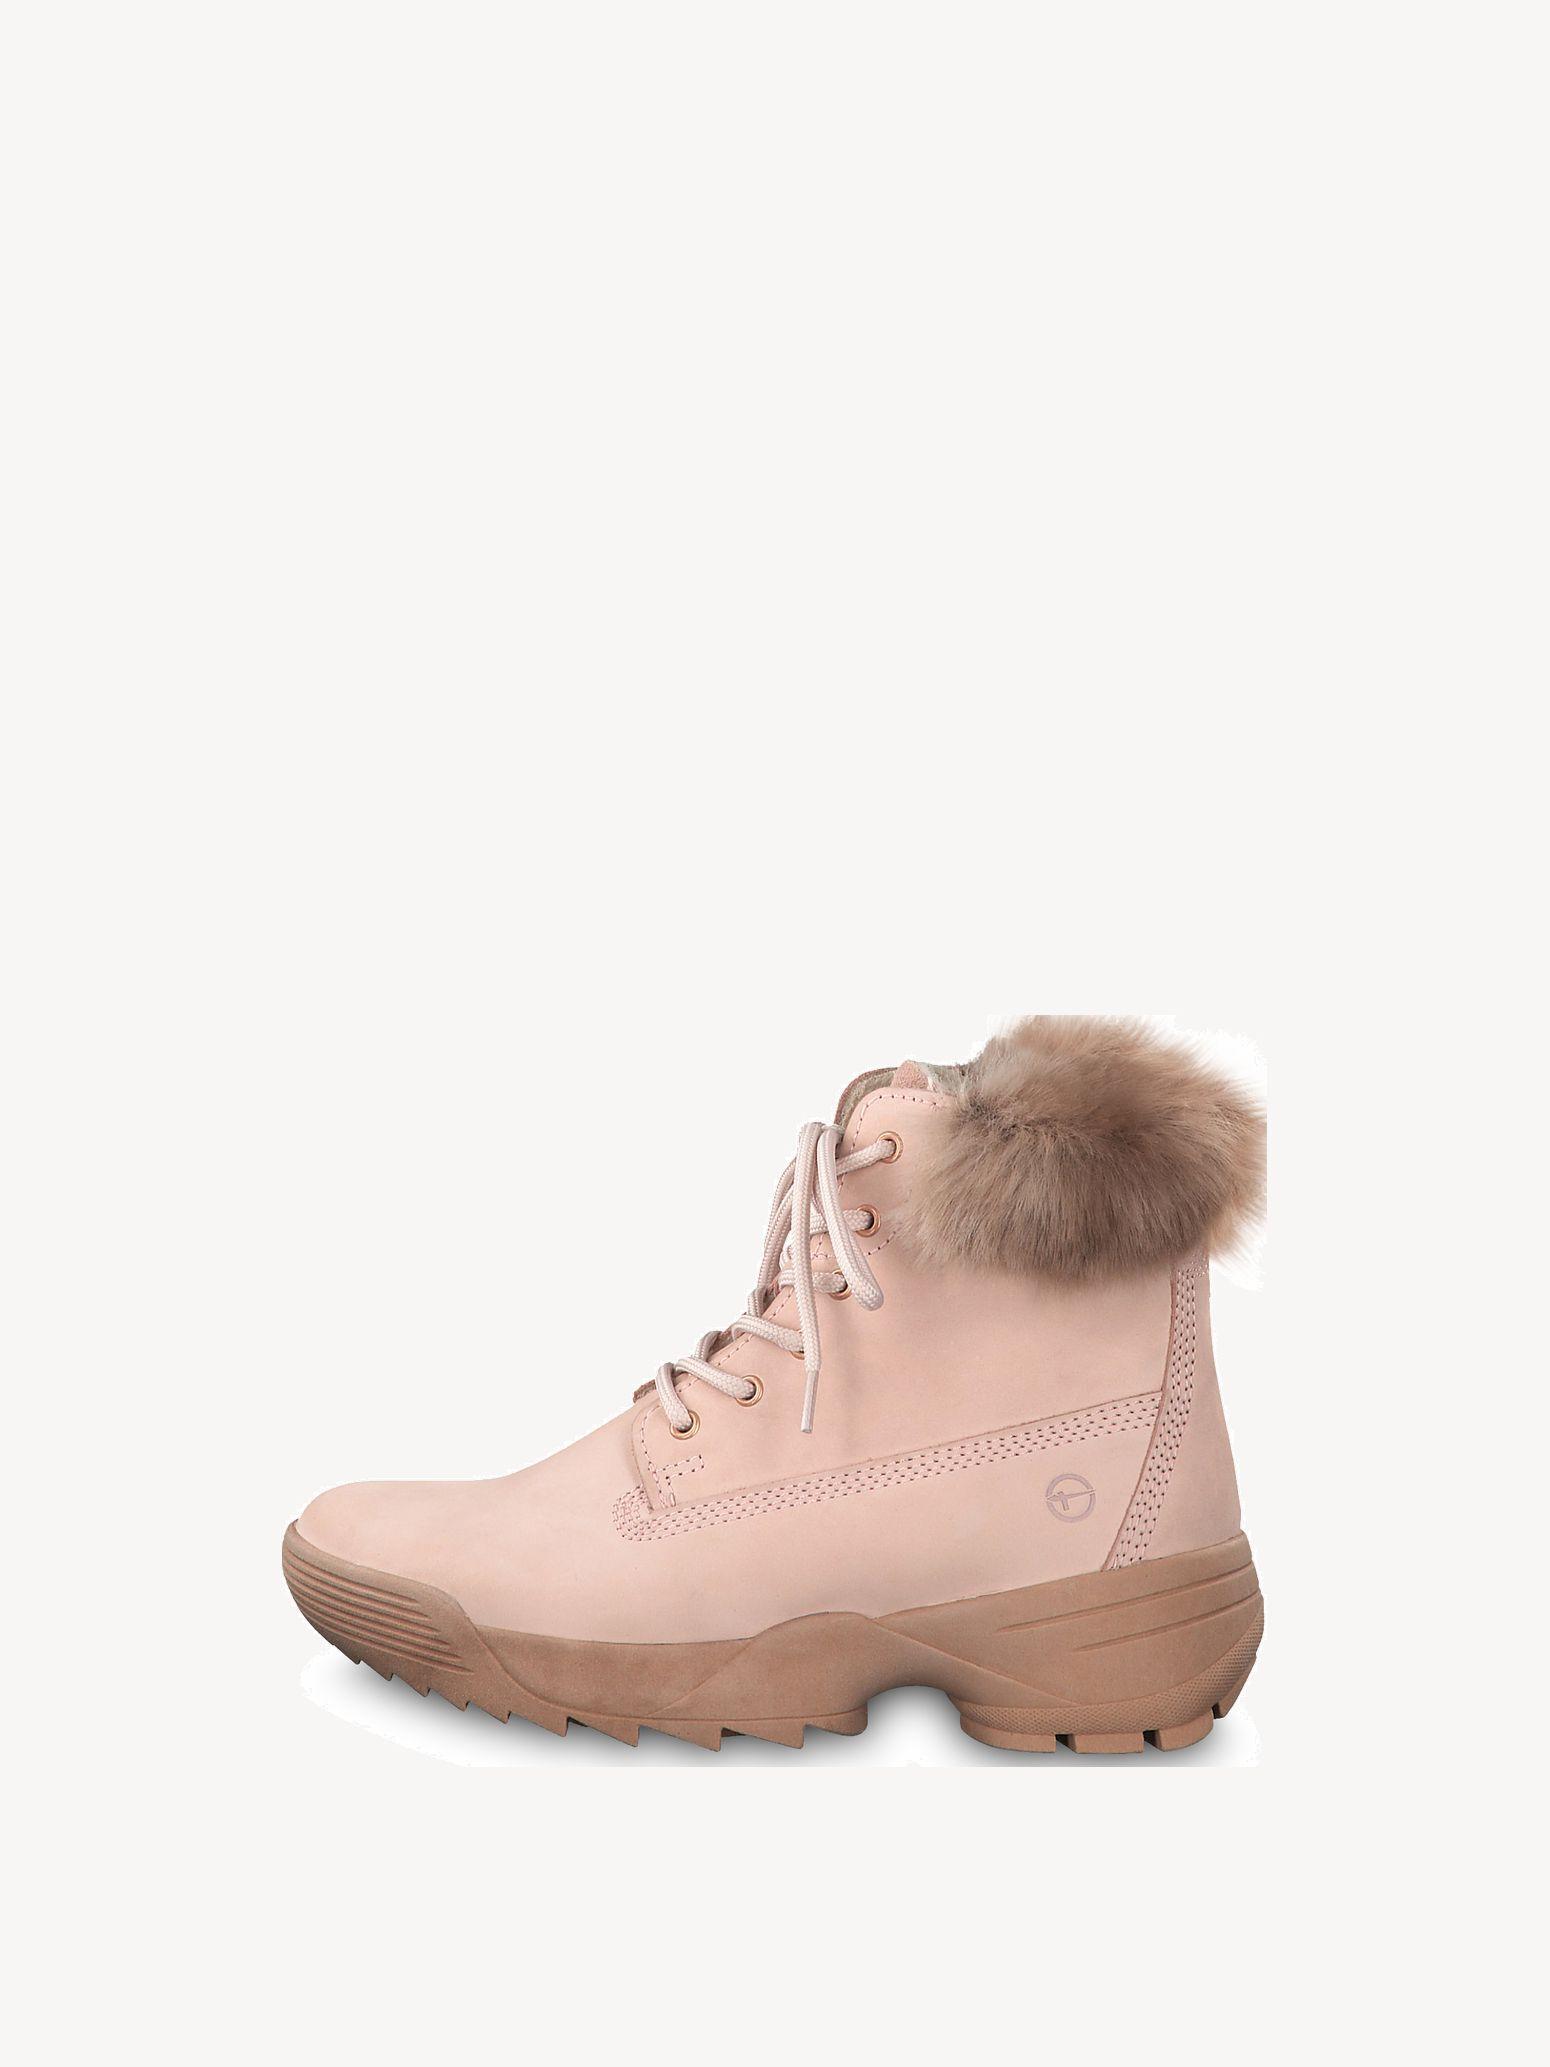 Bottines Chaussures Lacets Femmes Tamaris À rexoWCdB